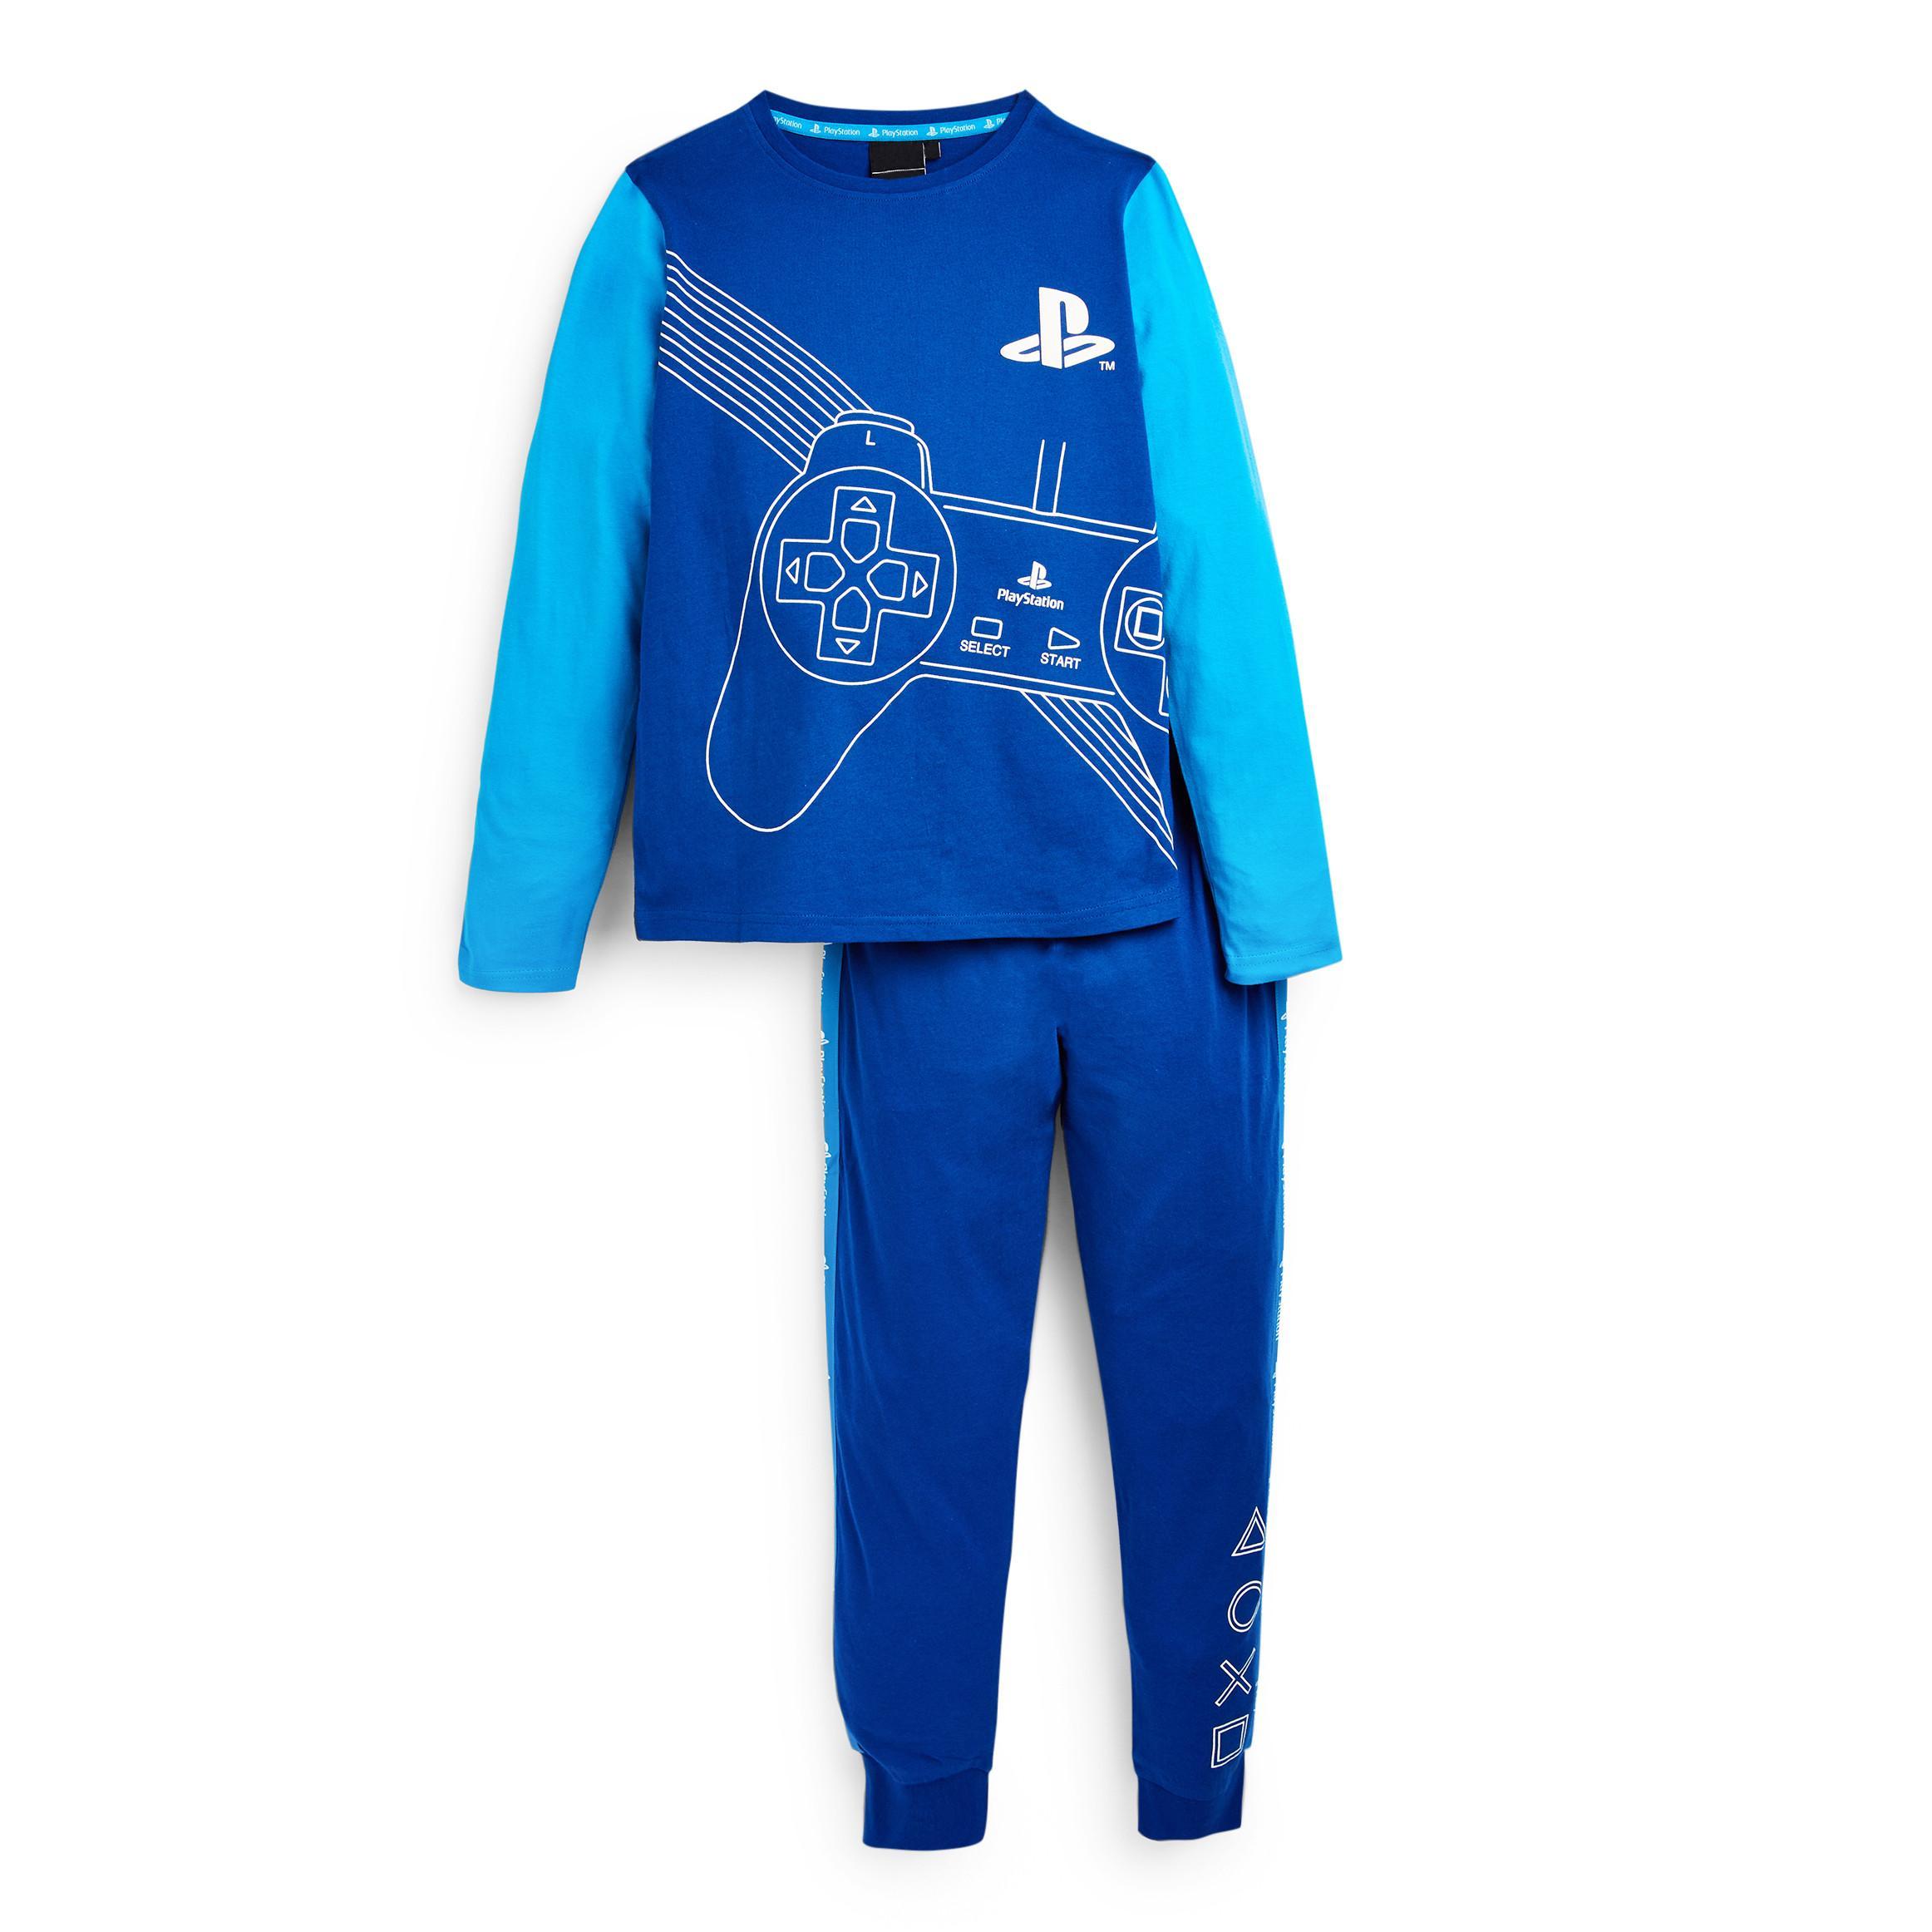 Official PlayStation Kids Boys Nightwear Comfy Pyjama Set BNWT Primark Pack of 2